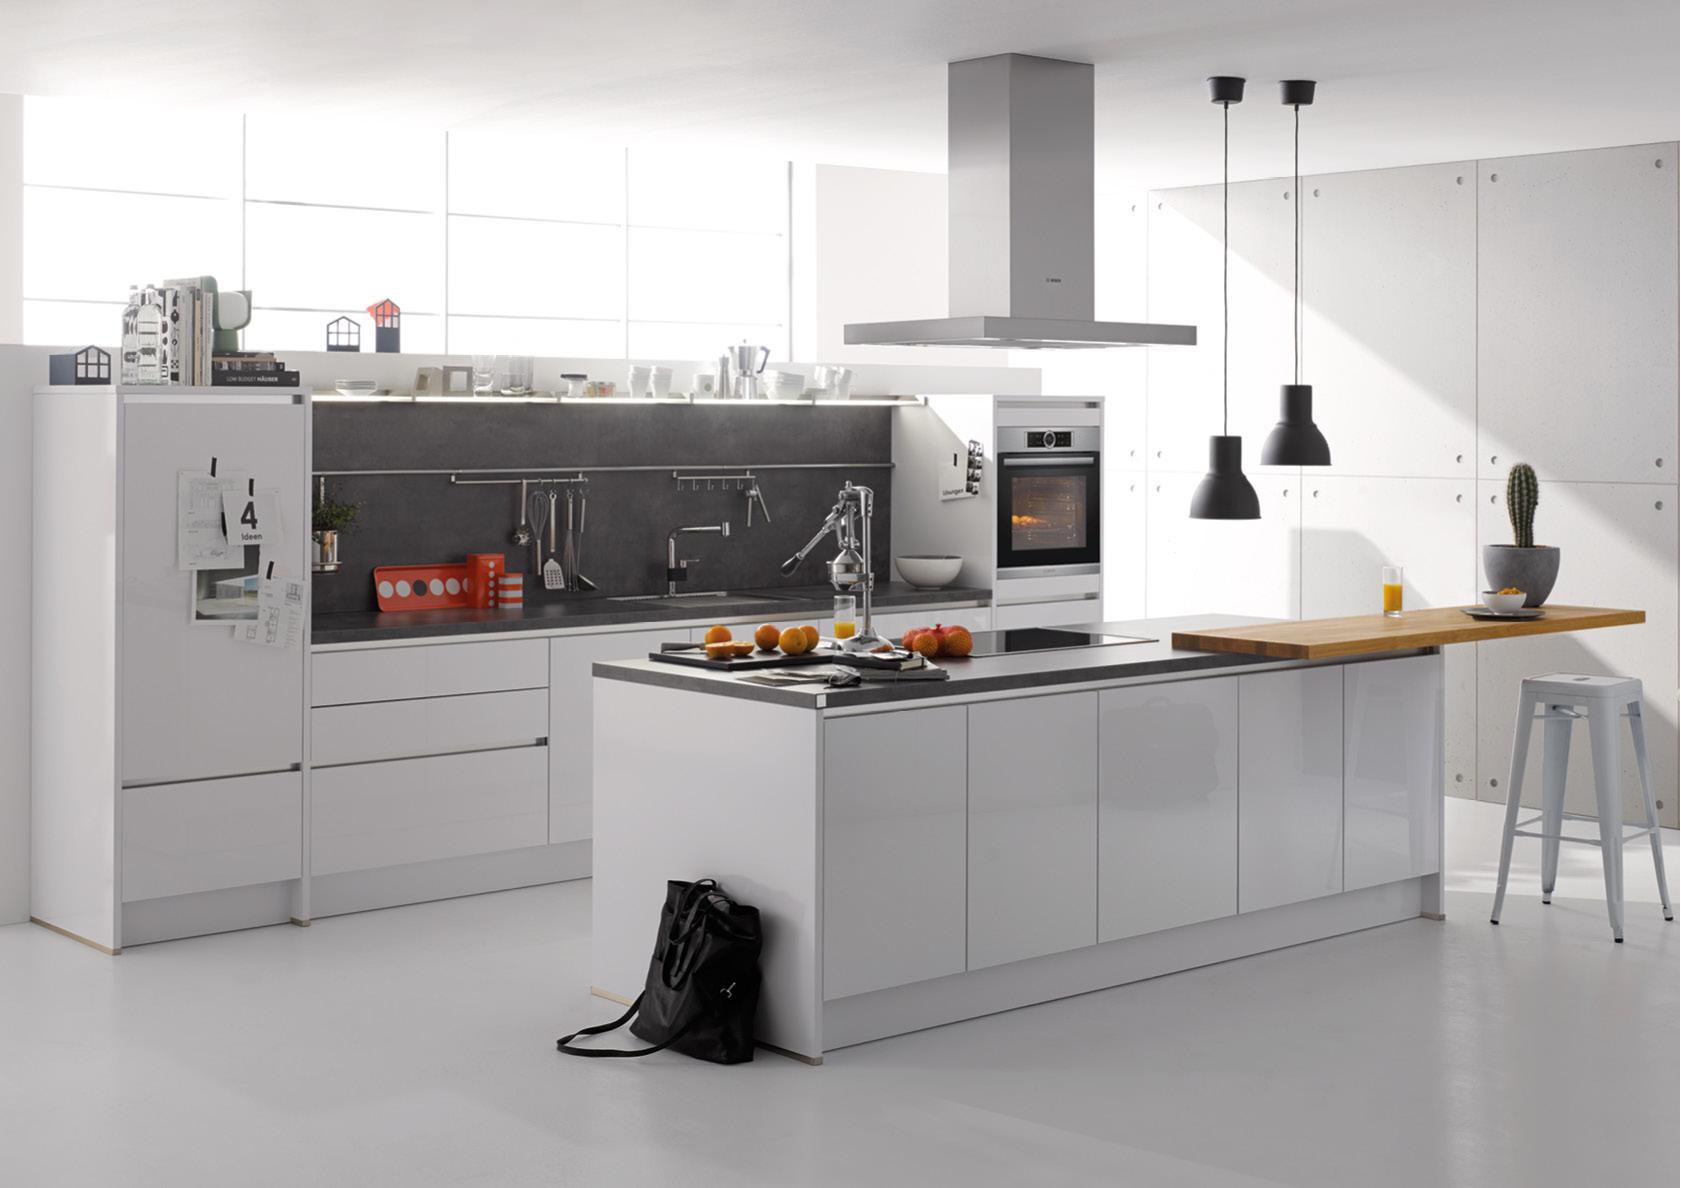 Küchen - Brand & Co. Gf.: Heide Wienewski in Extertal